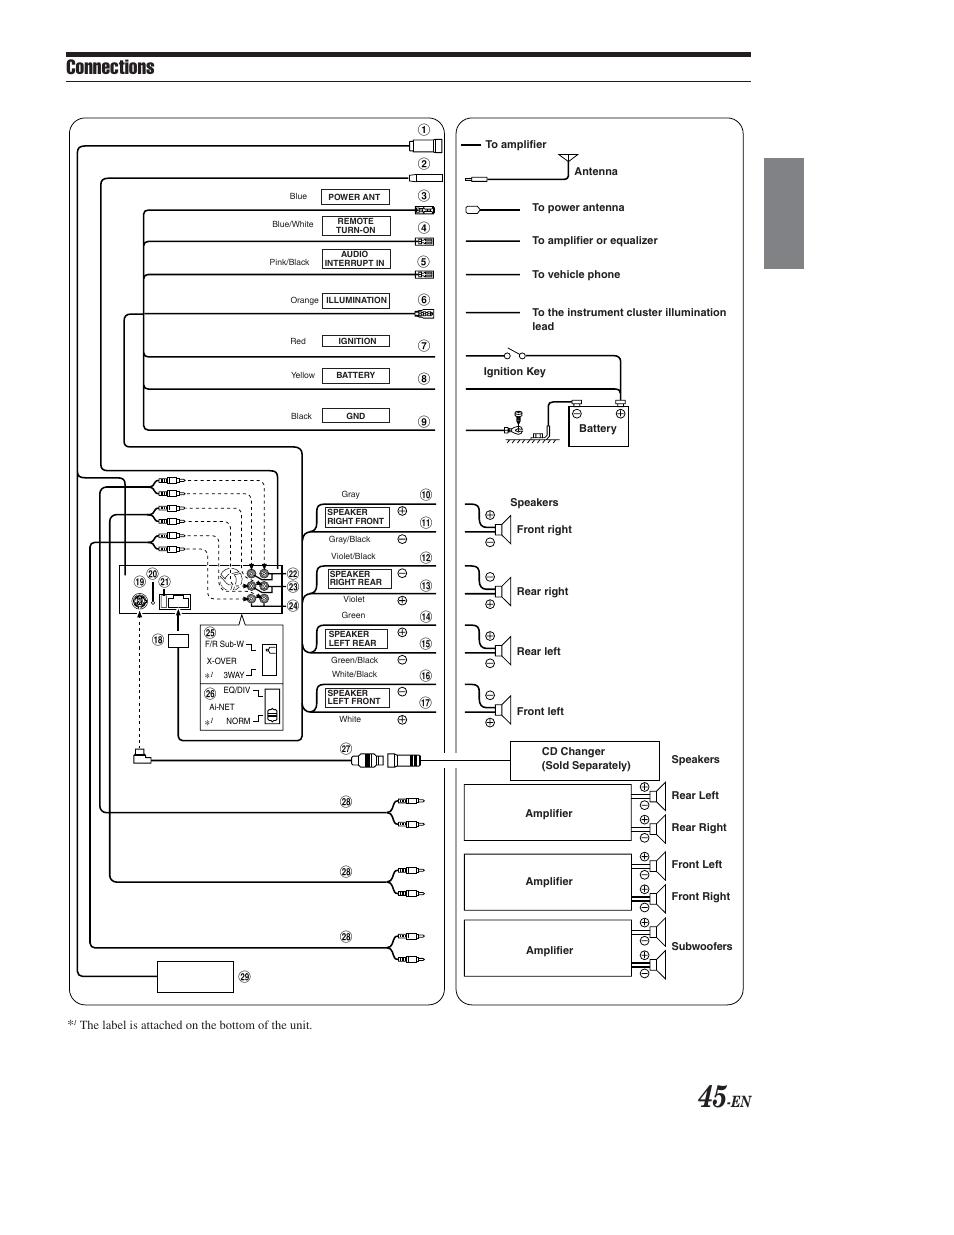 medium resolution of wiring connections alpine cda 9853 user manual page 46 55 mix alpine cda wiring diagram